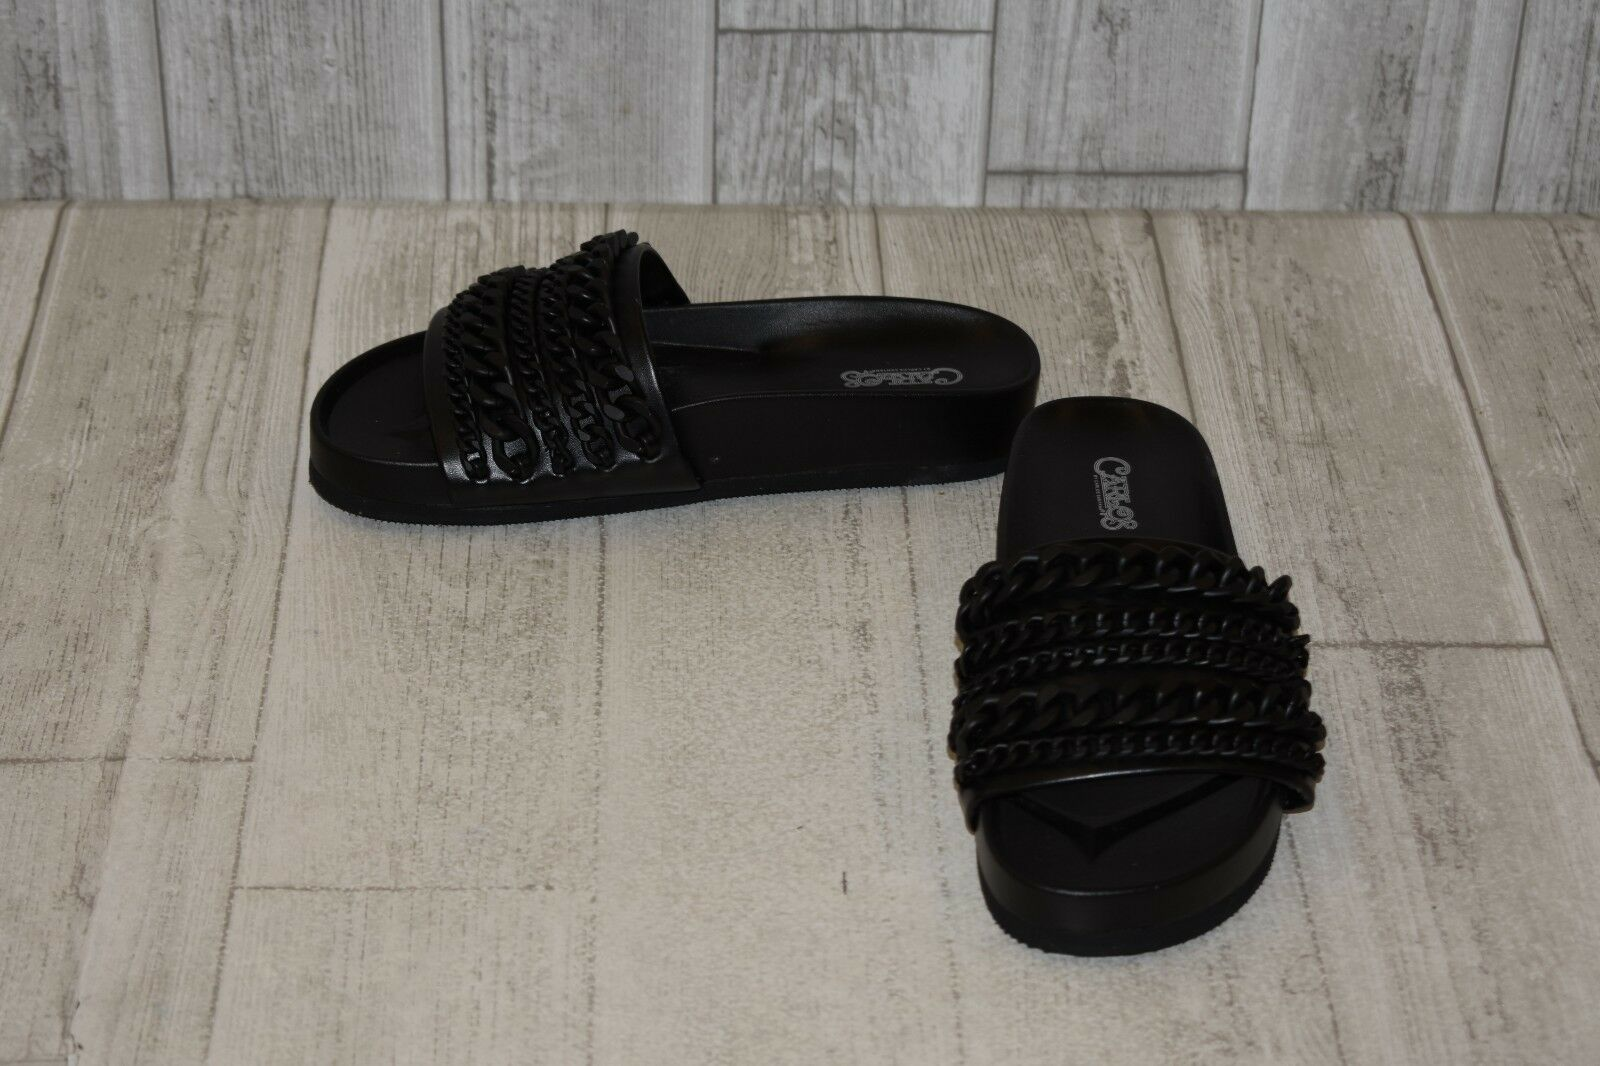 CARLOS by Carlos Santana Zoey Faux Leather Slide Sandals, Women's 8M, Black